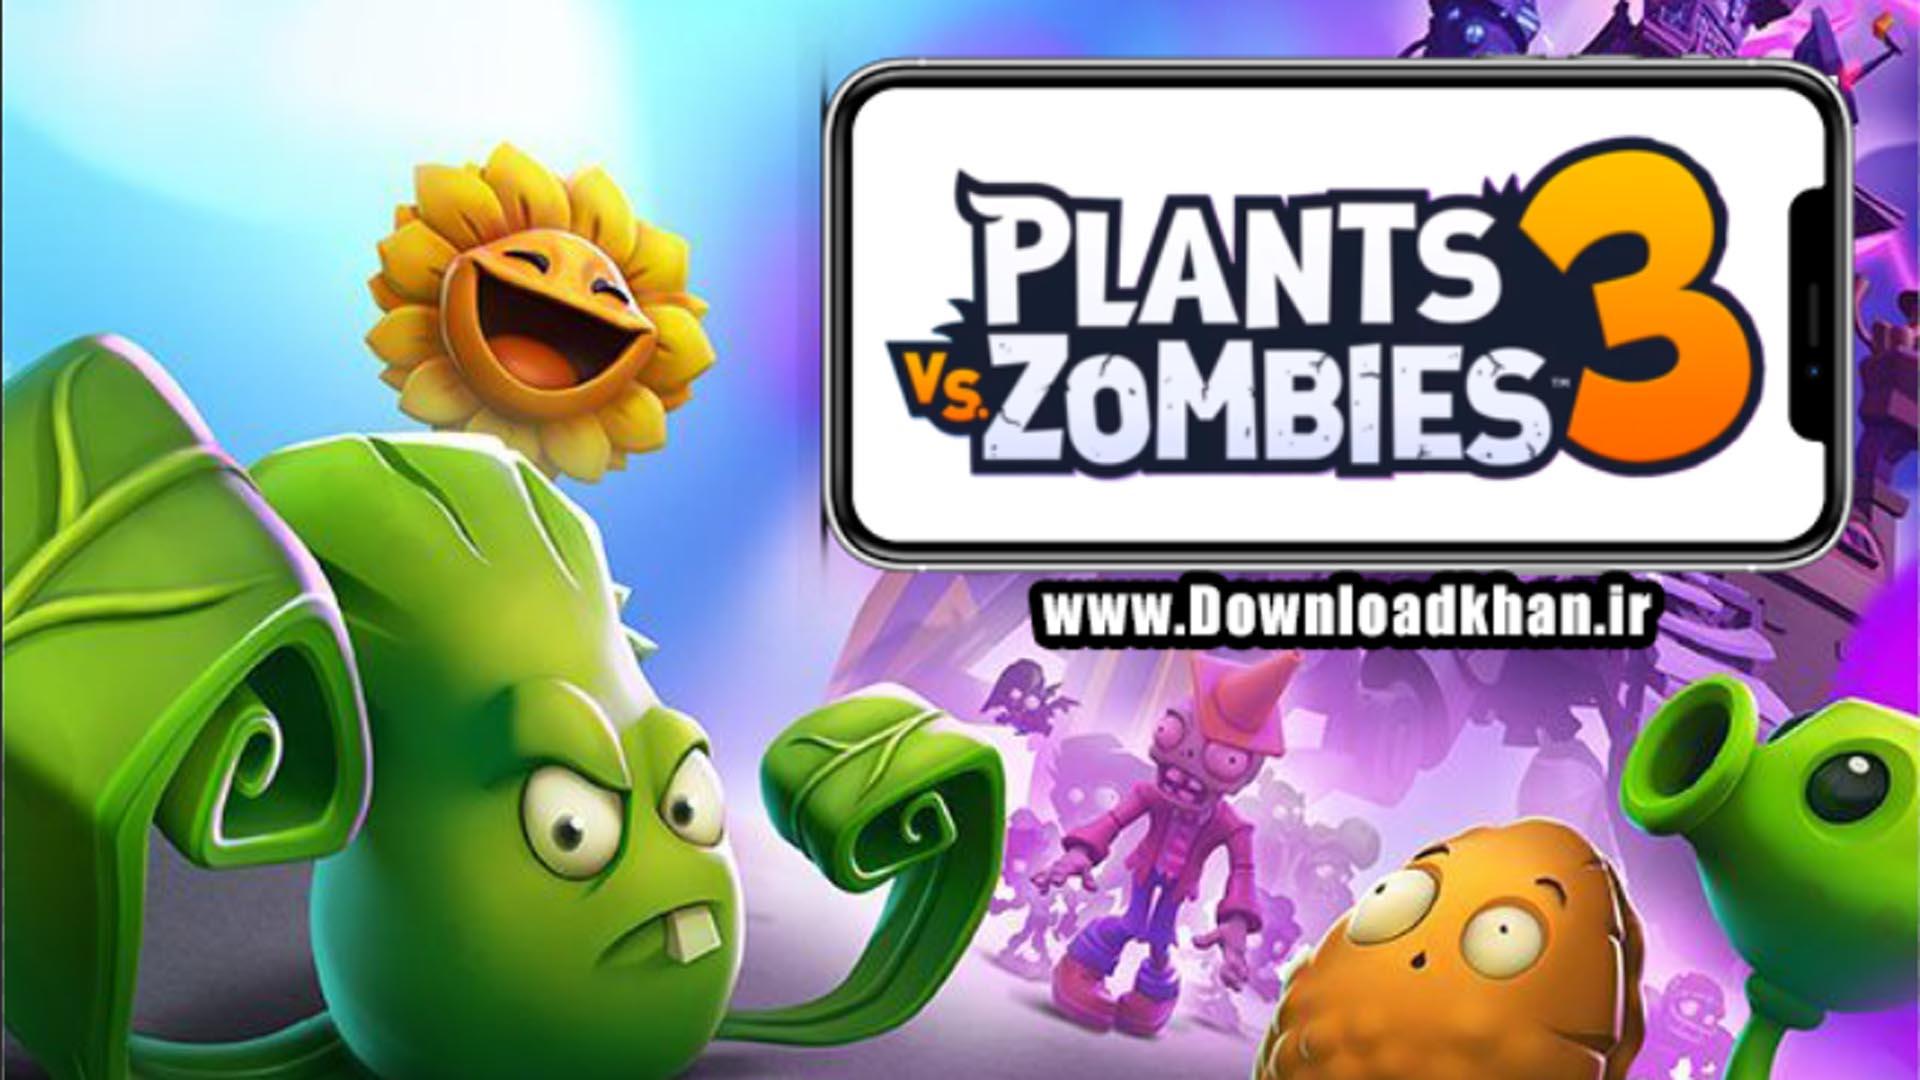 planet vs zombies 3